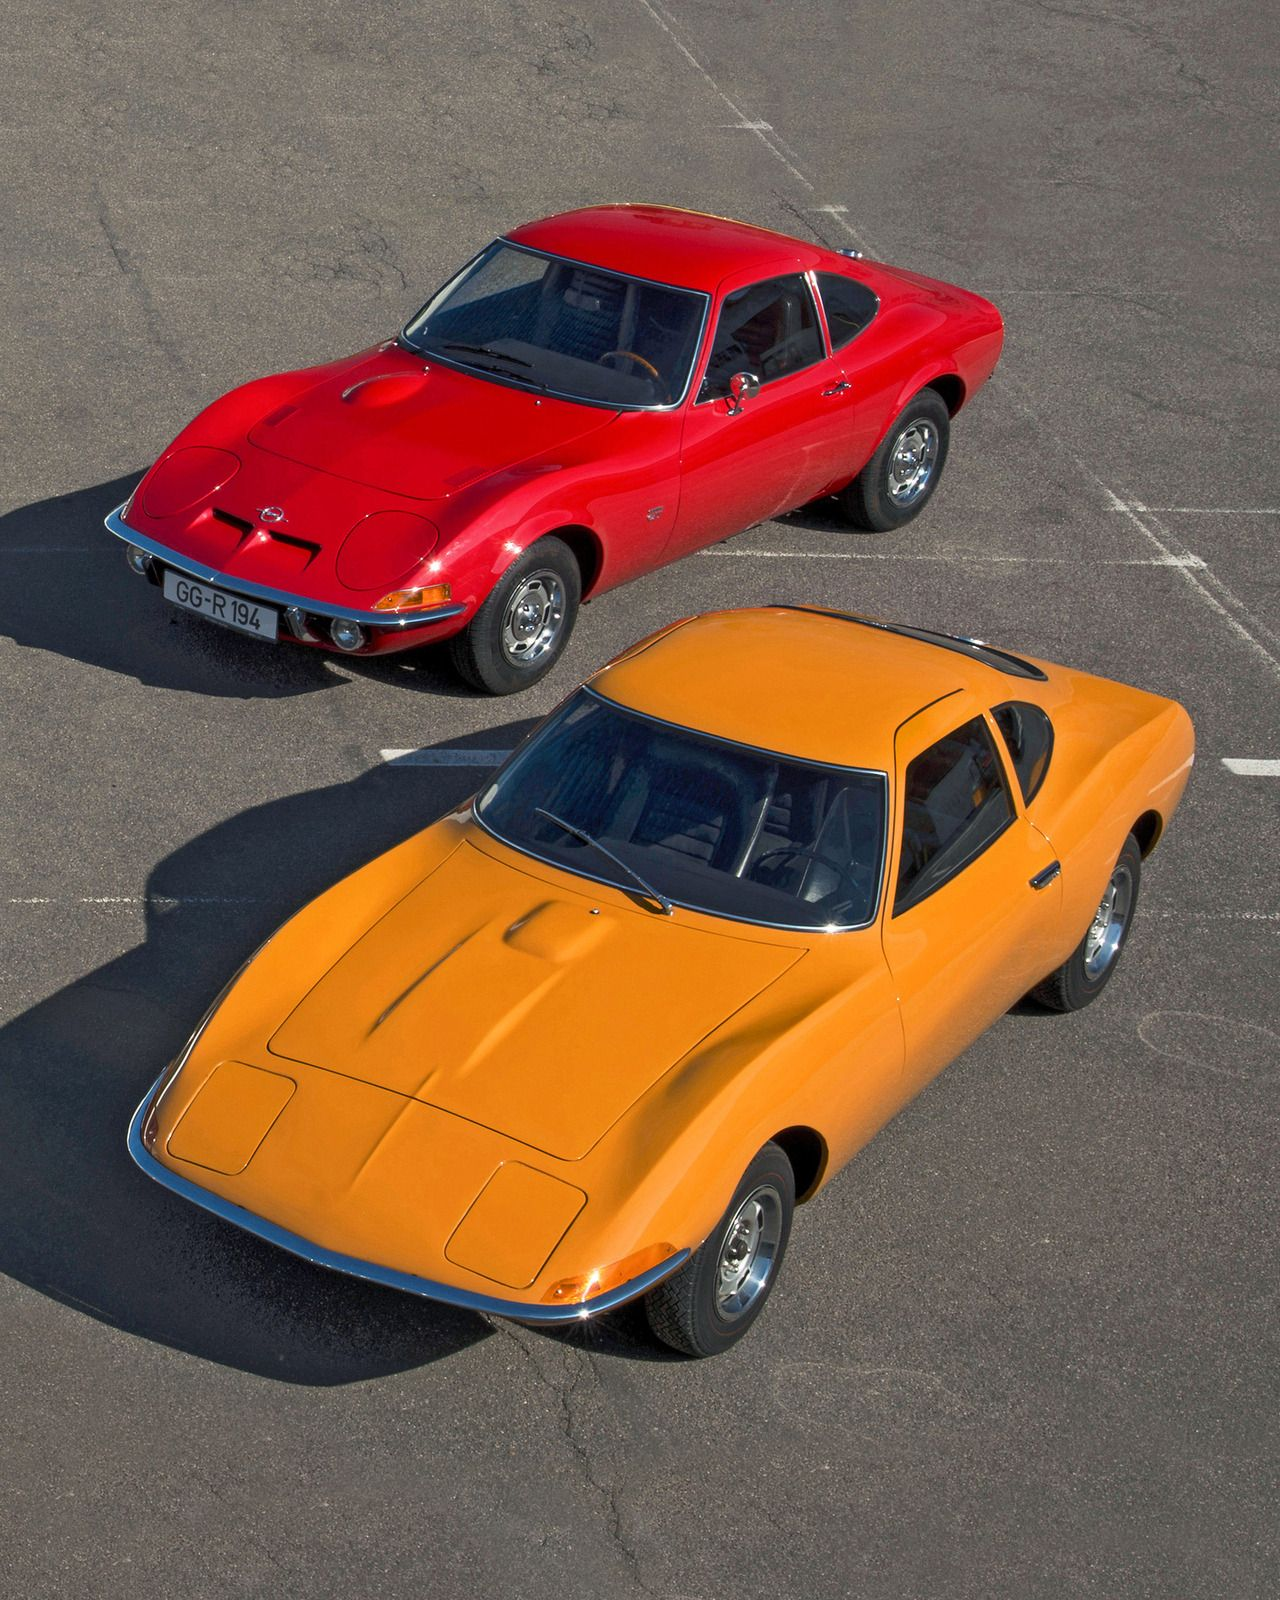 Vintageclassiccars: Opel GT